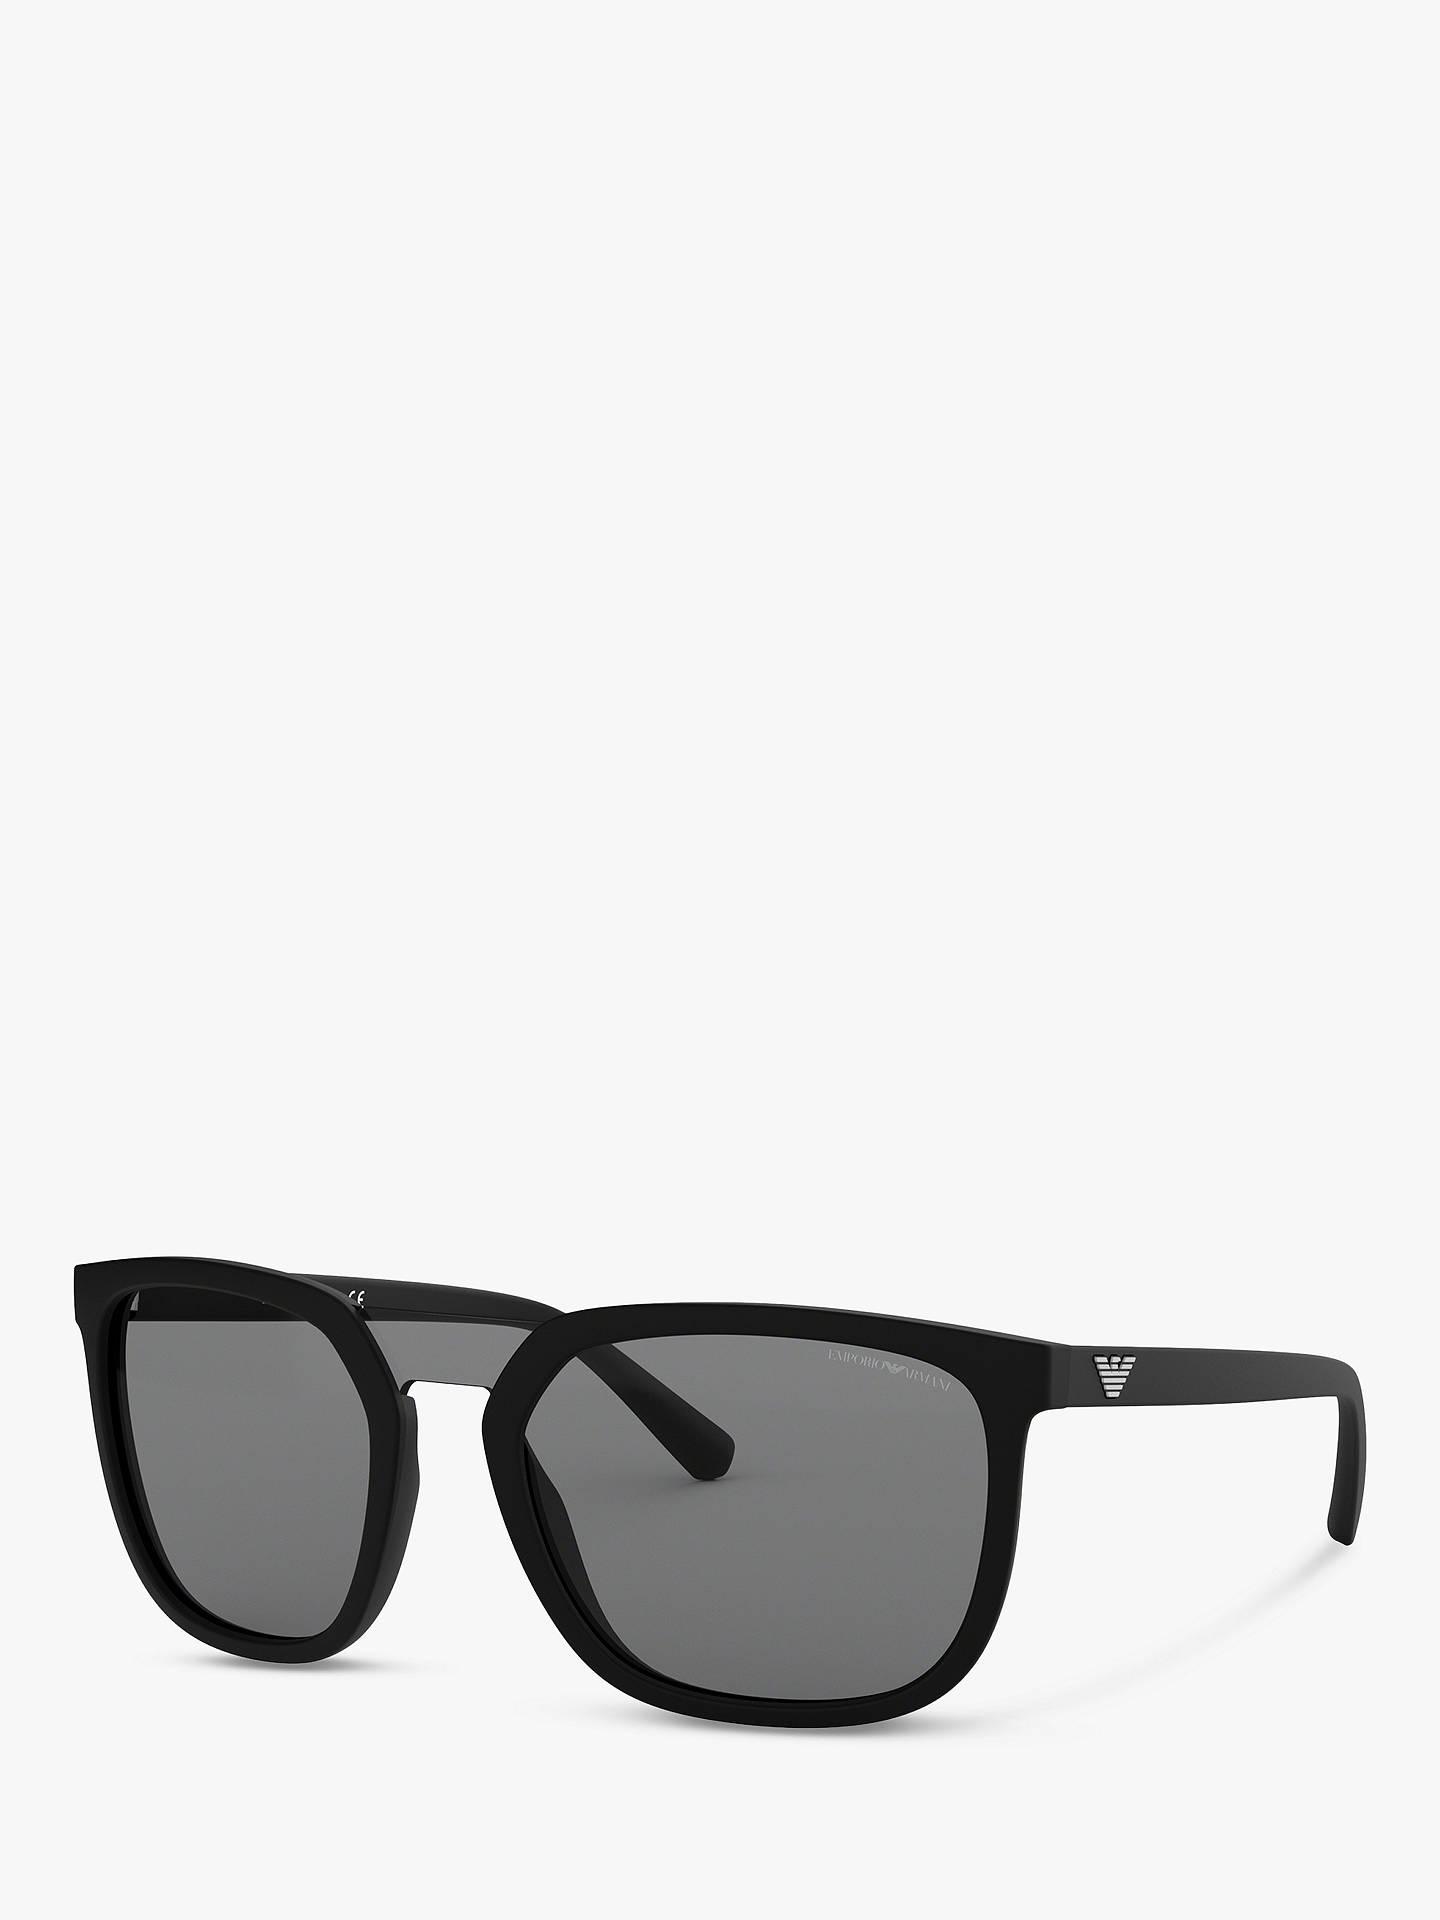 5b7790ba8a65 Emporio Armani EA4123 Men s Square Sunglasses at John Lewis   Partners